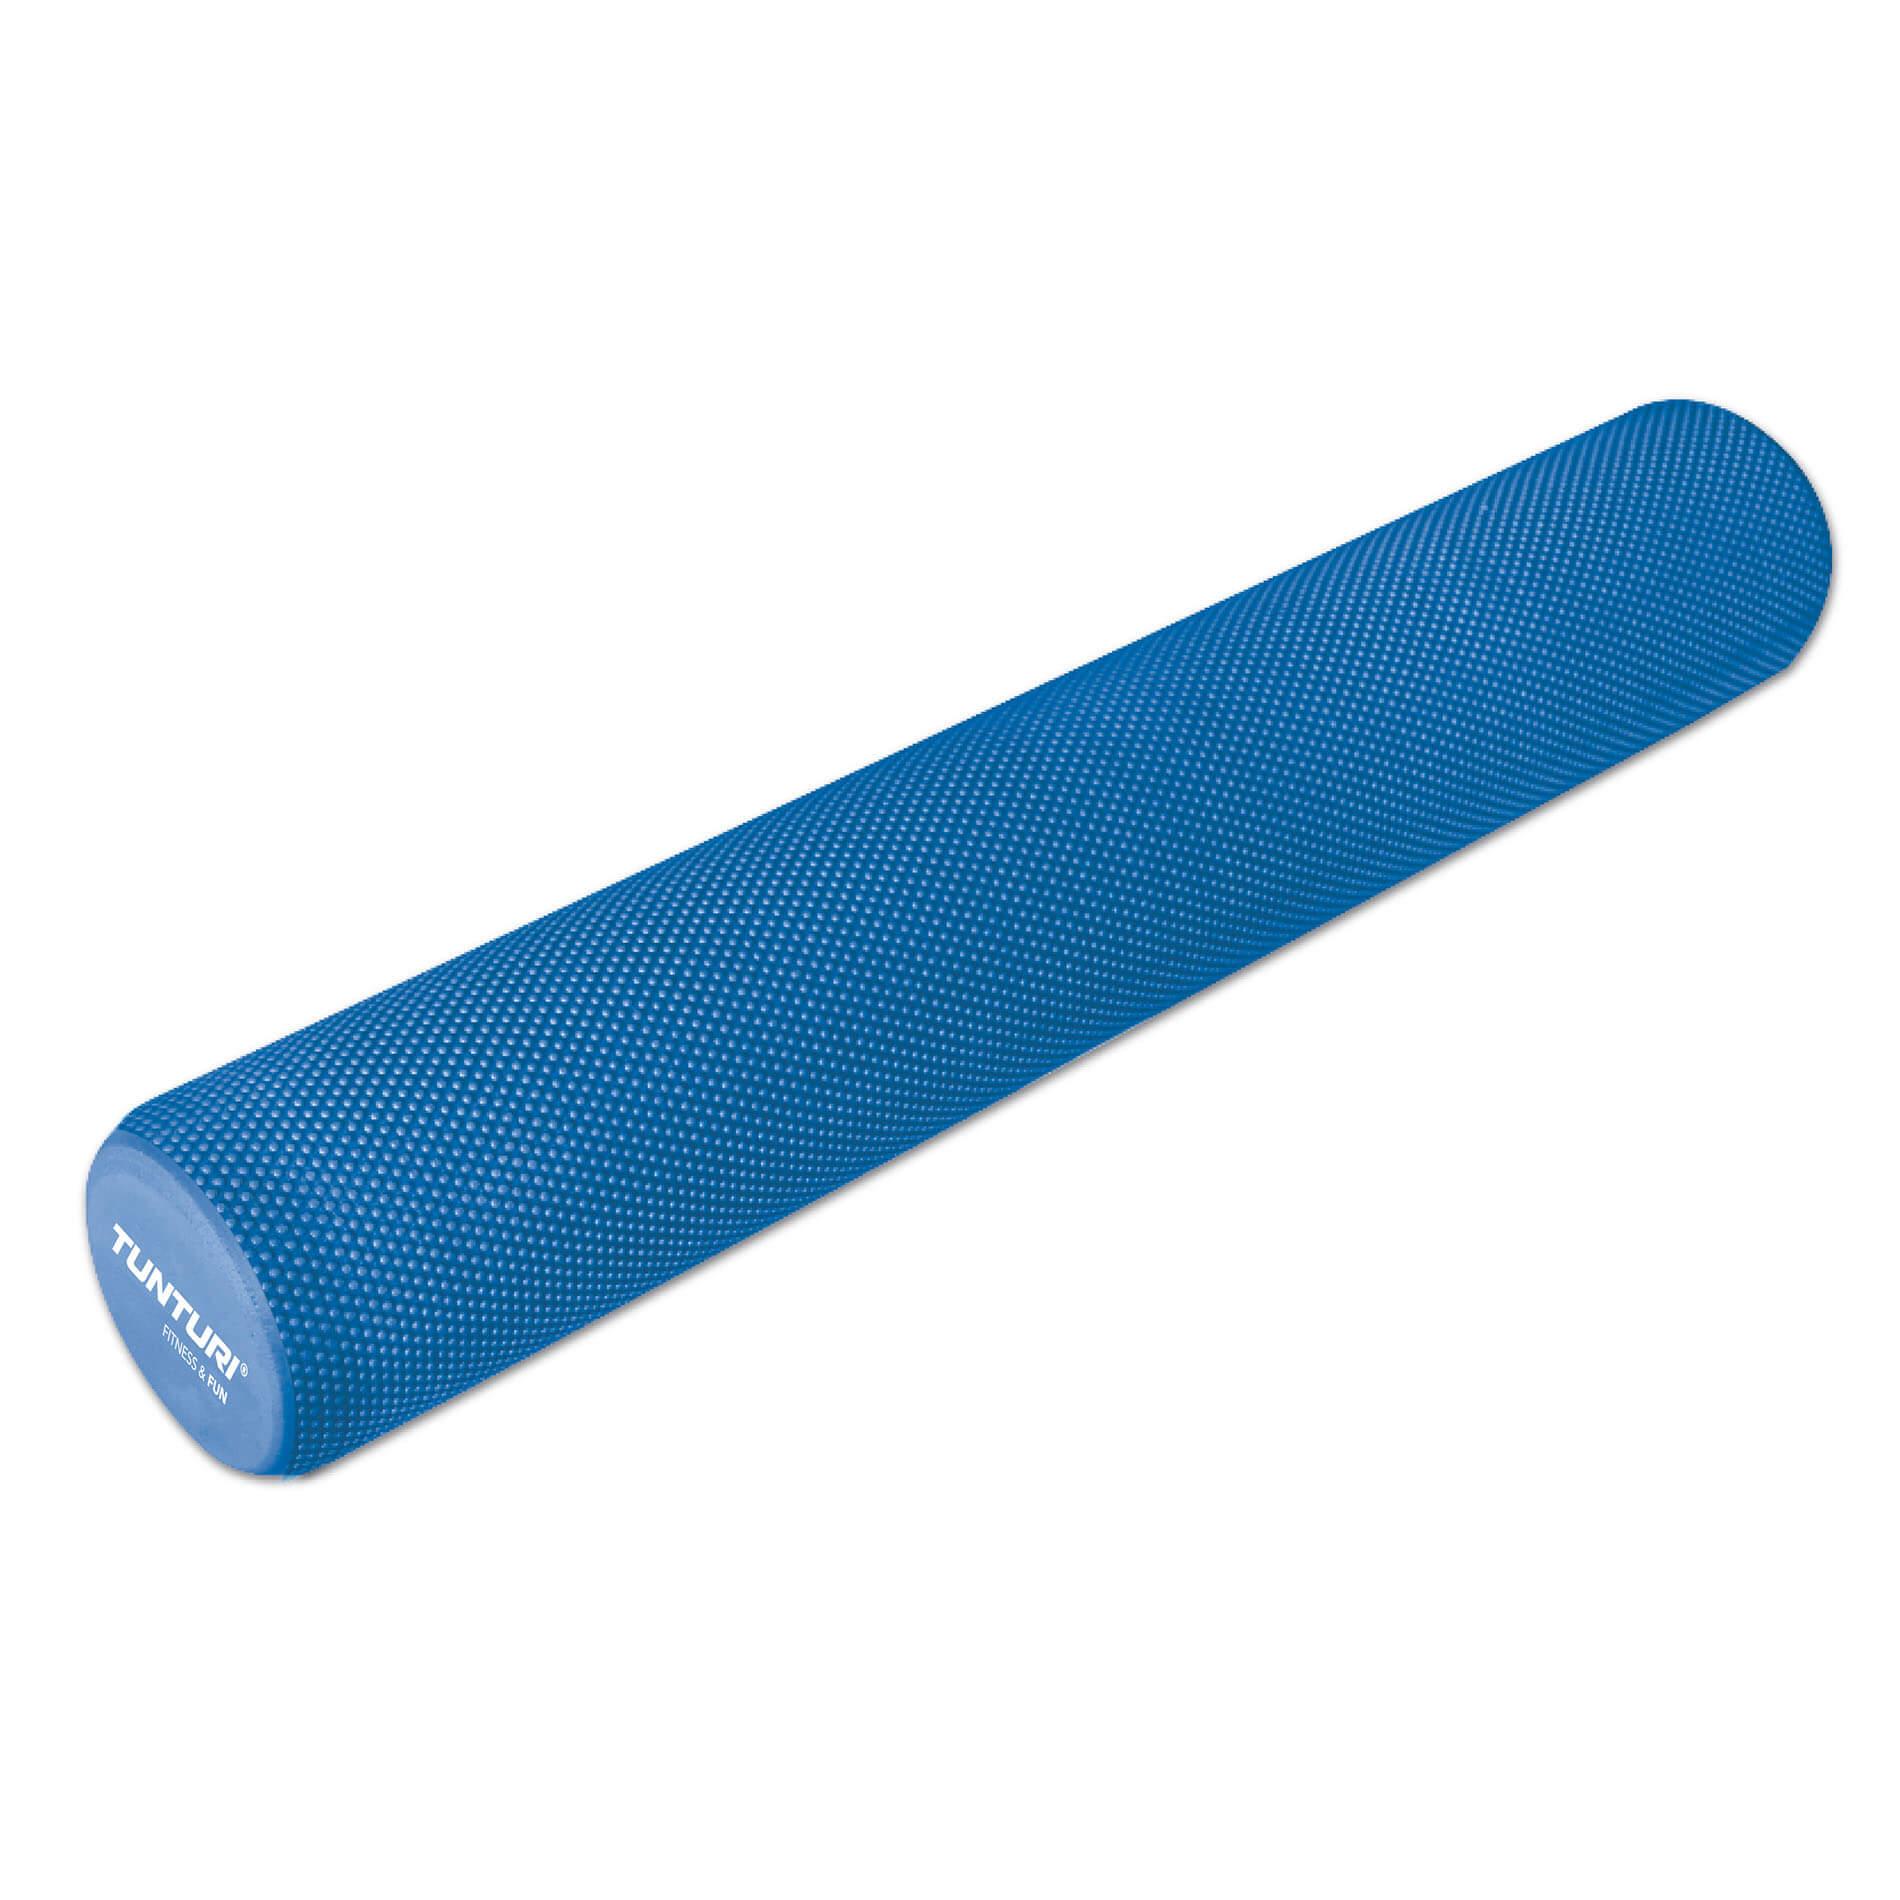 Yoga Massage Roller EVA